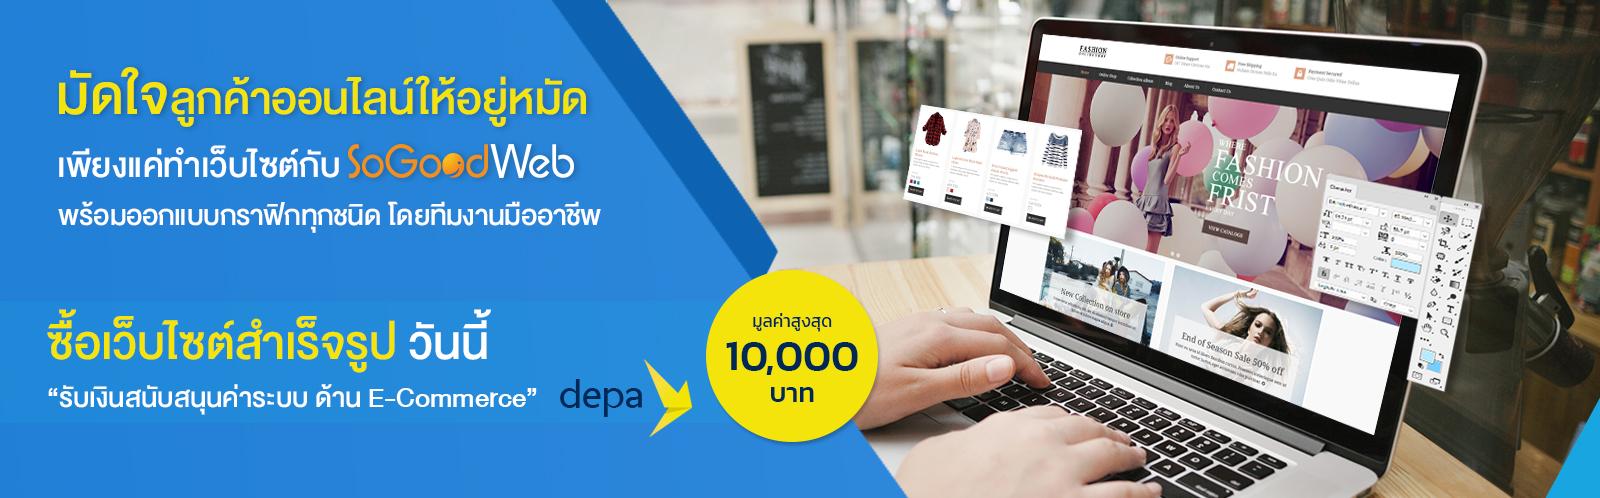 depa ส่งเสริม SMEs สนับสนุนค่าระบบ เว็บไซต์สำเร็จรูป SoGoodWeb